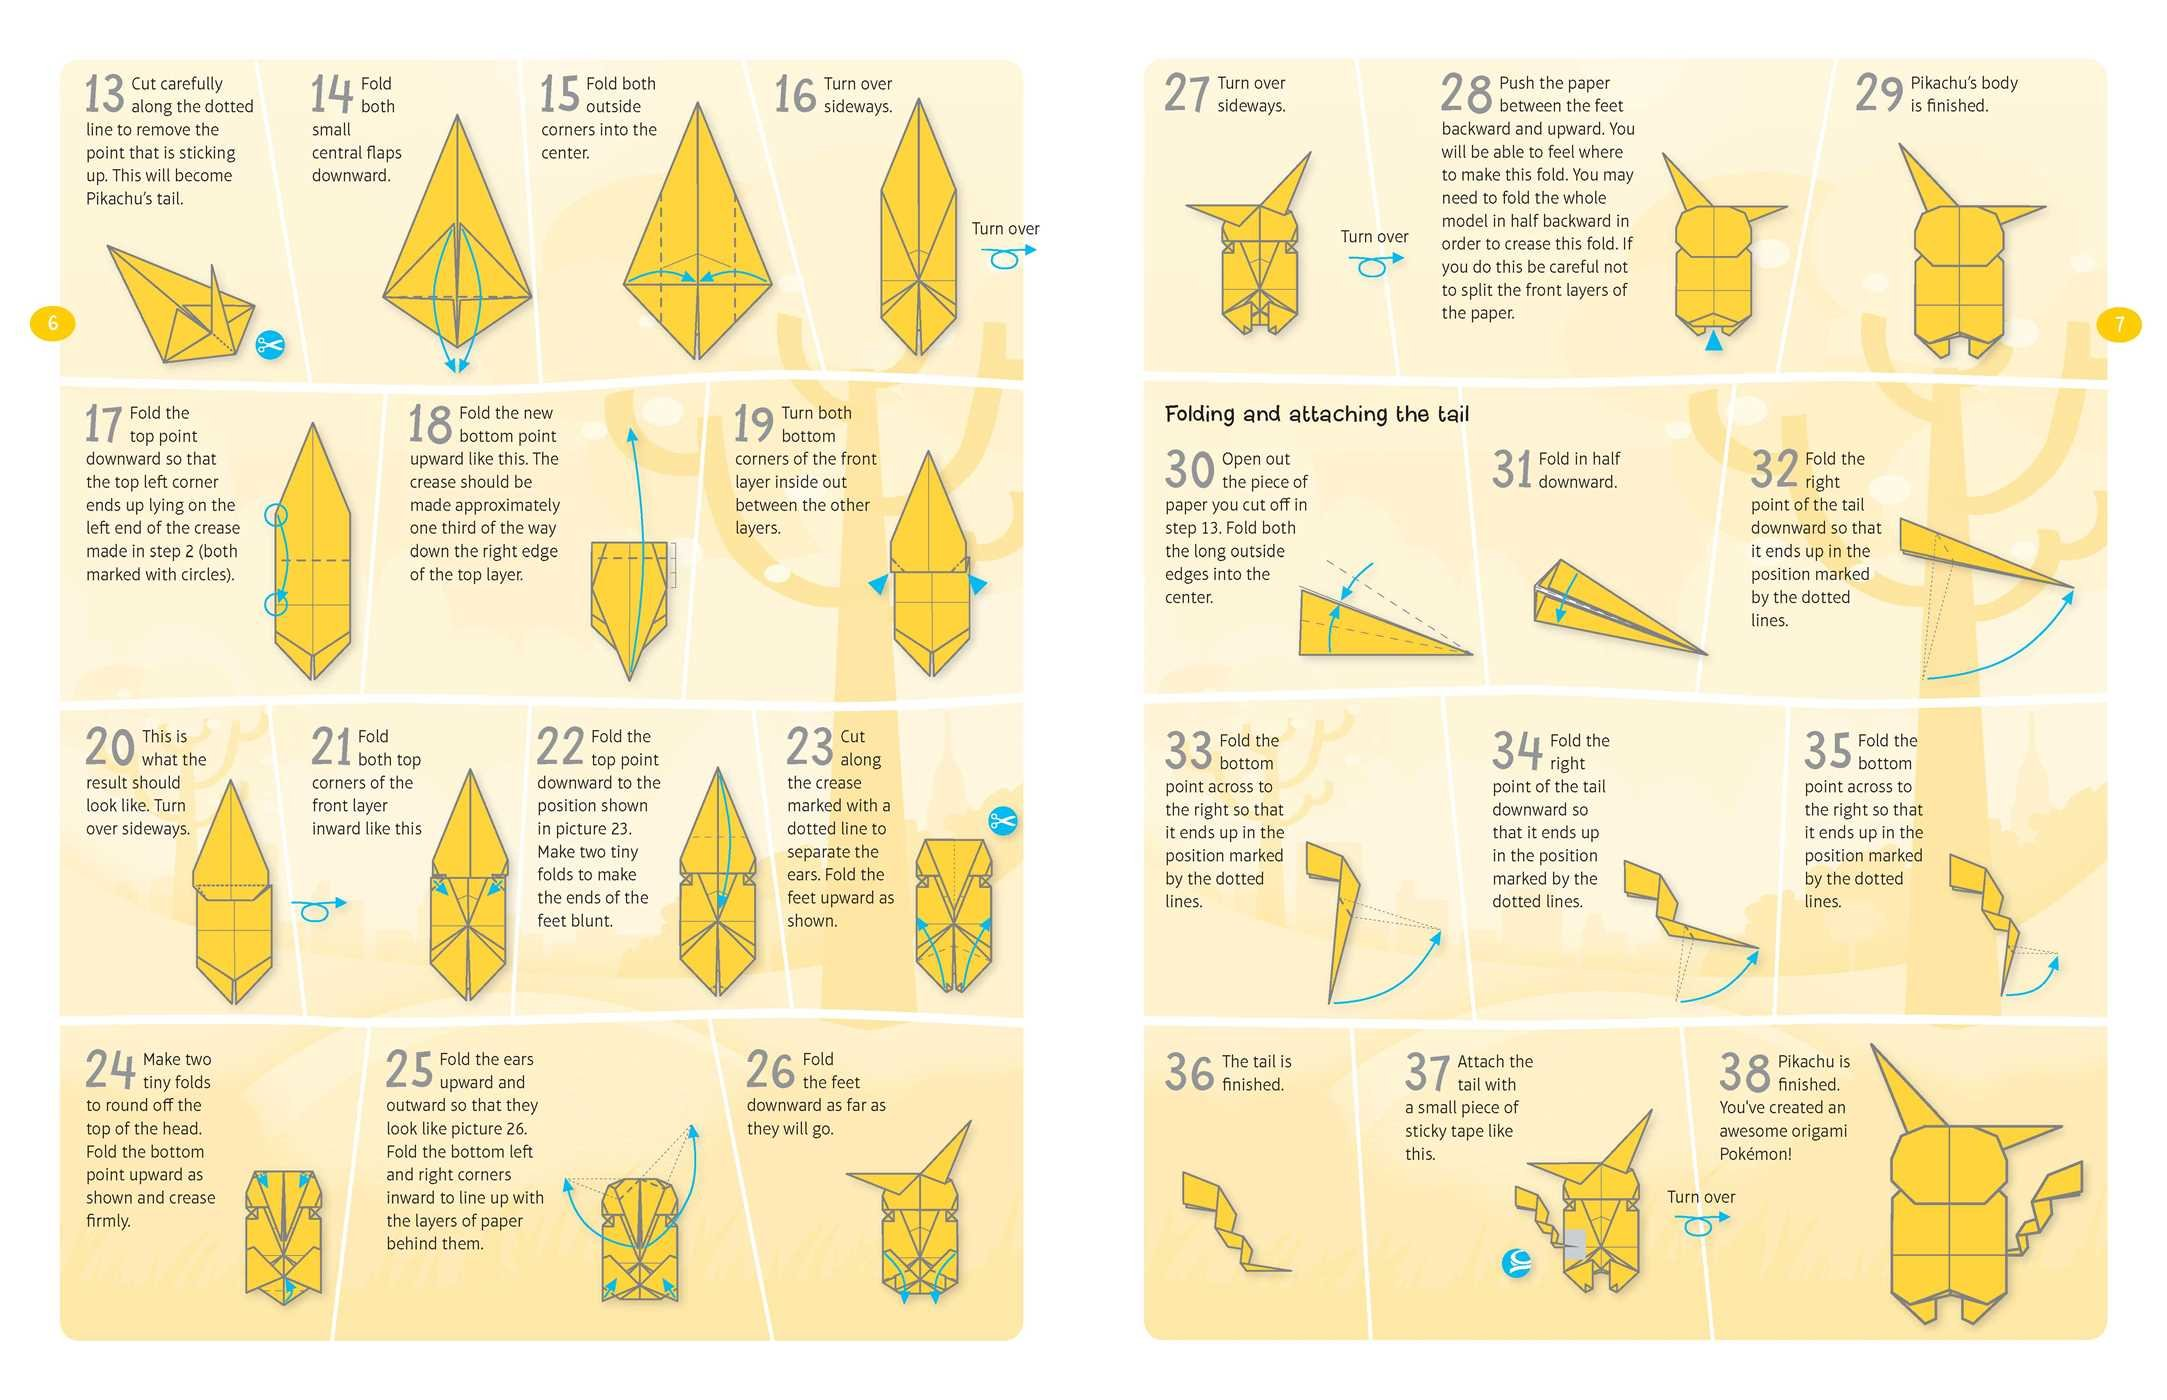 Pokemon origami fold your own pokemon amazon pikachu pokemon origami fold your own pokemon amazon pikachu press 9781604381832 books jeuxipadfo Gallery